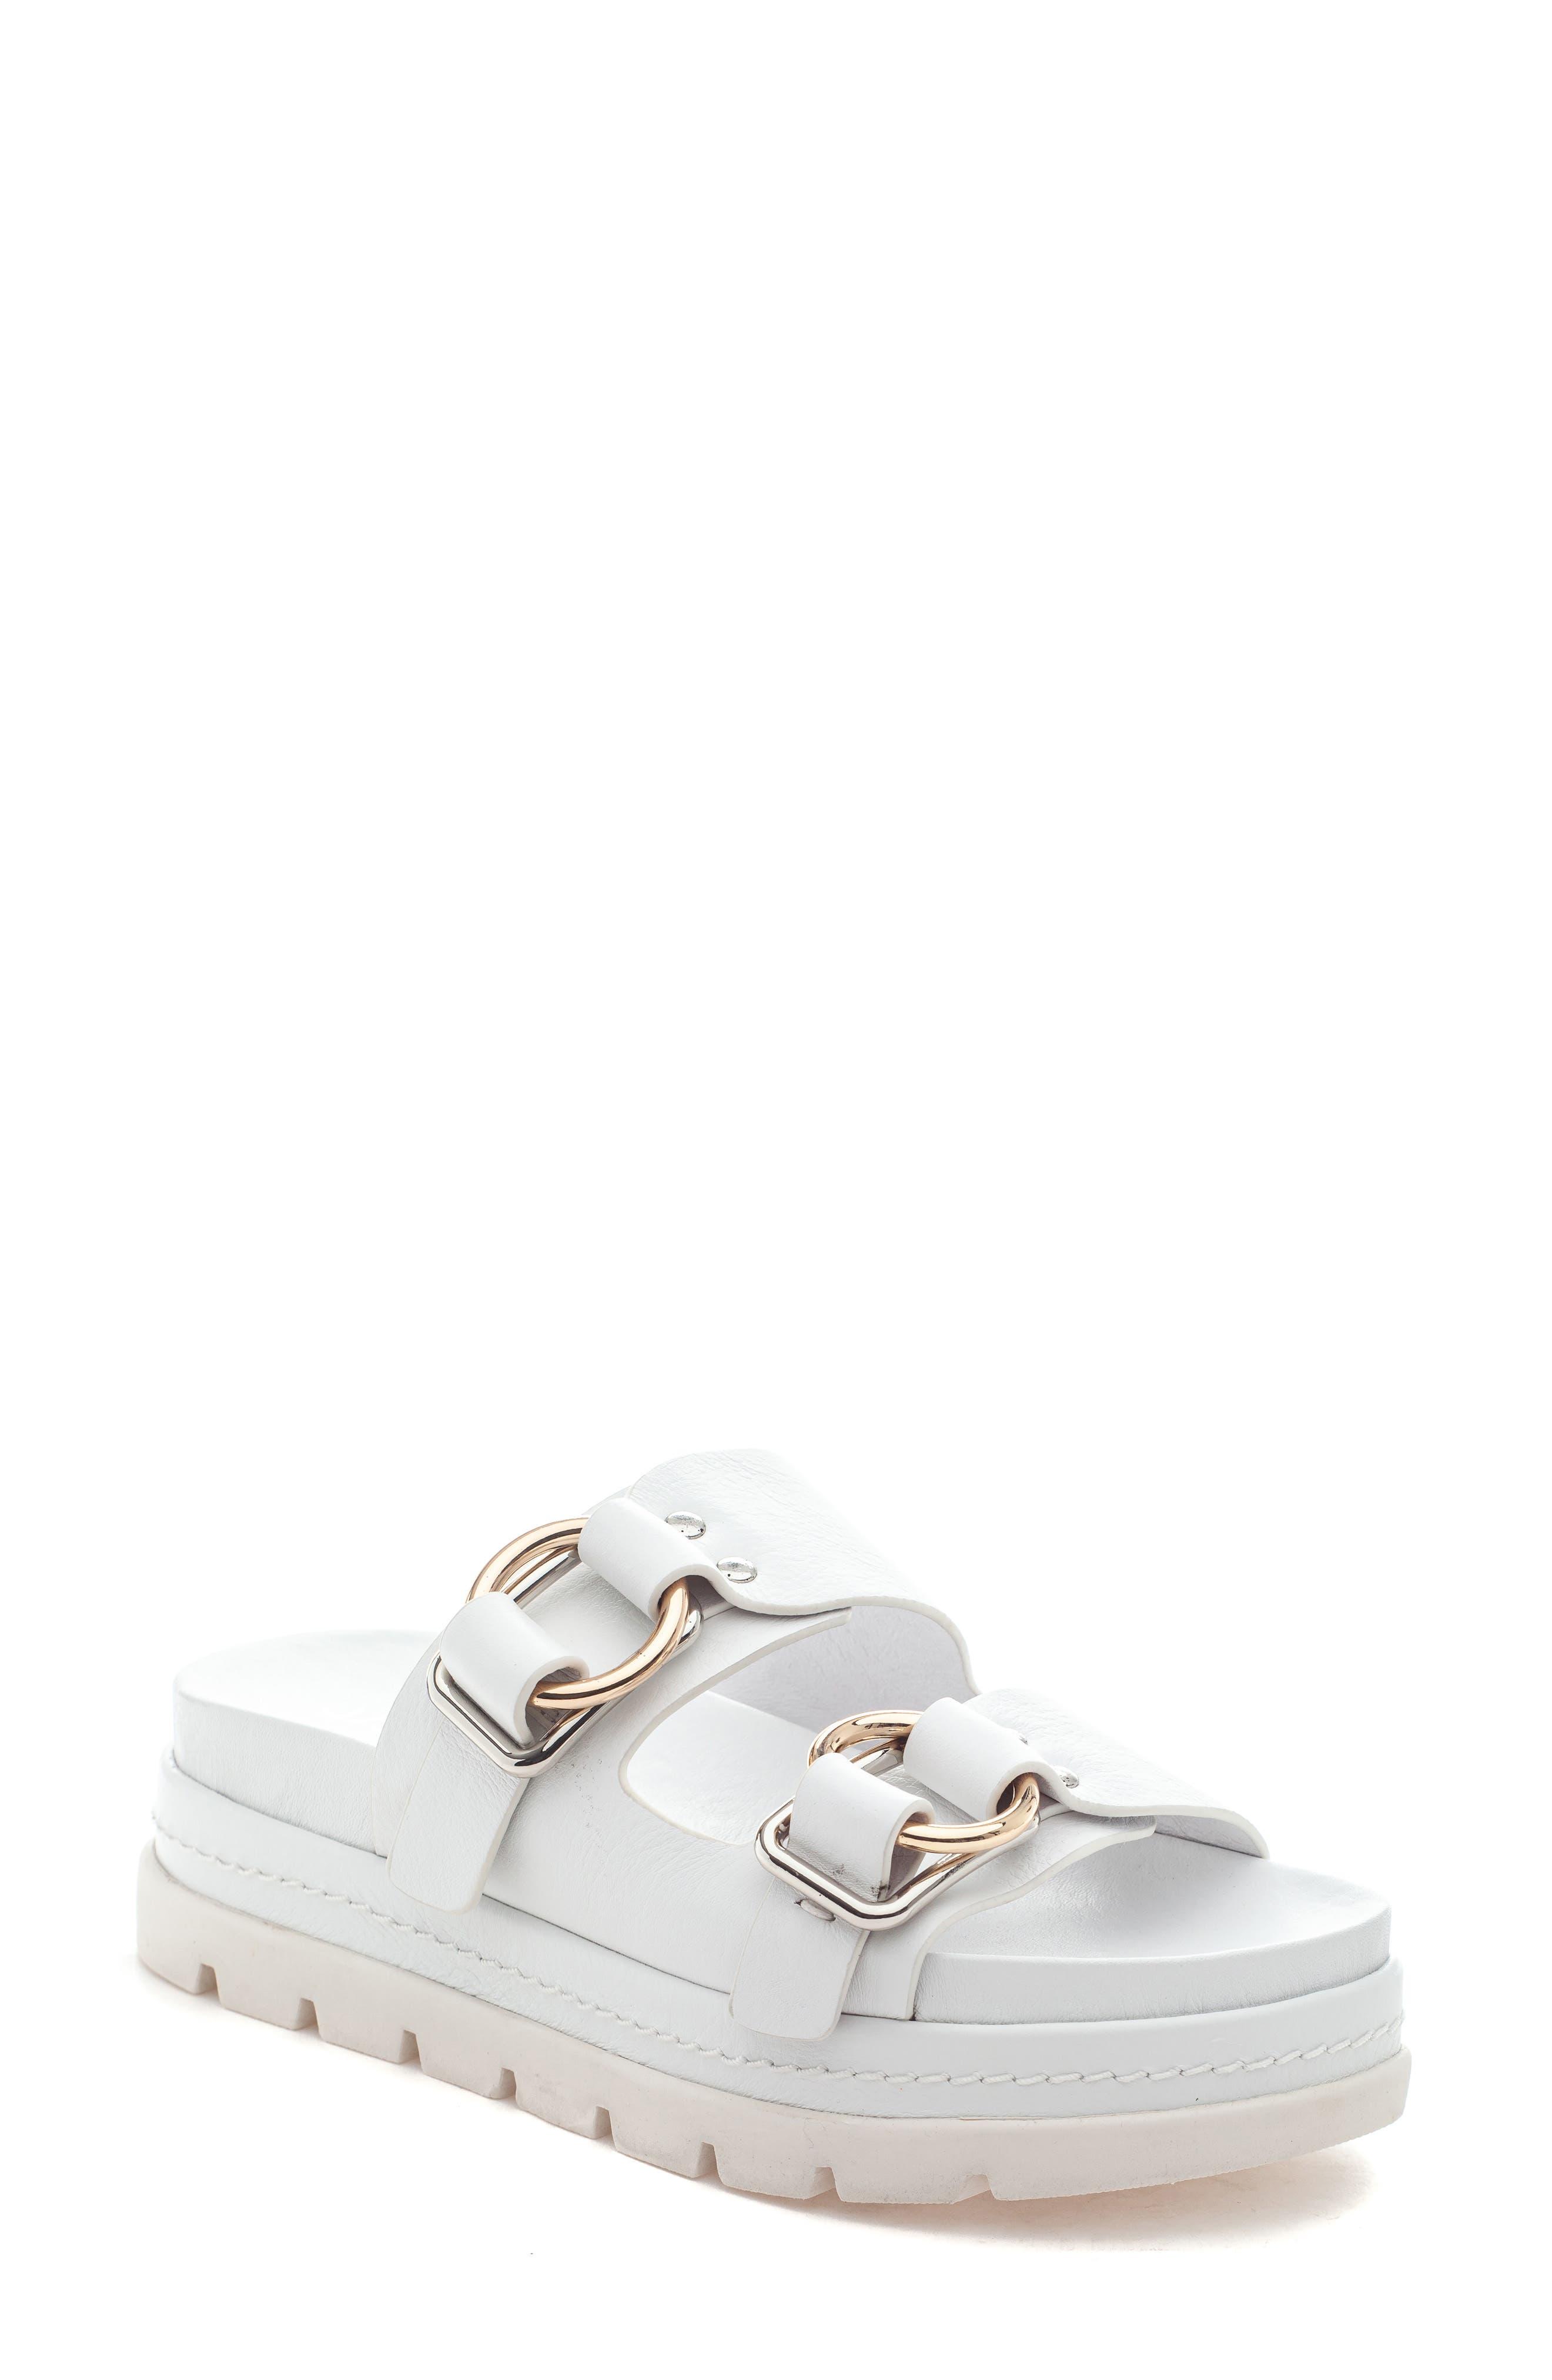 Baha Slide Sandal